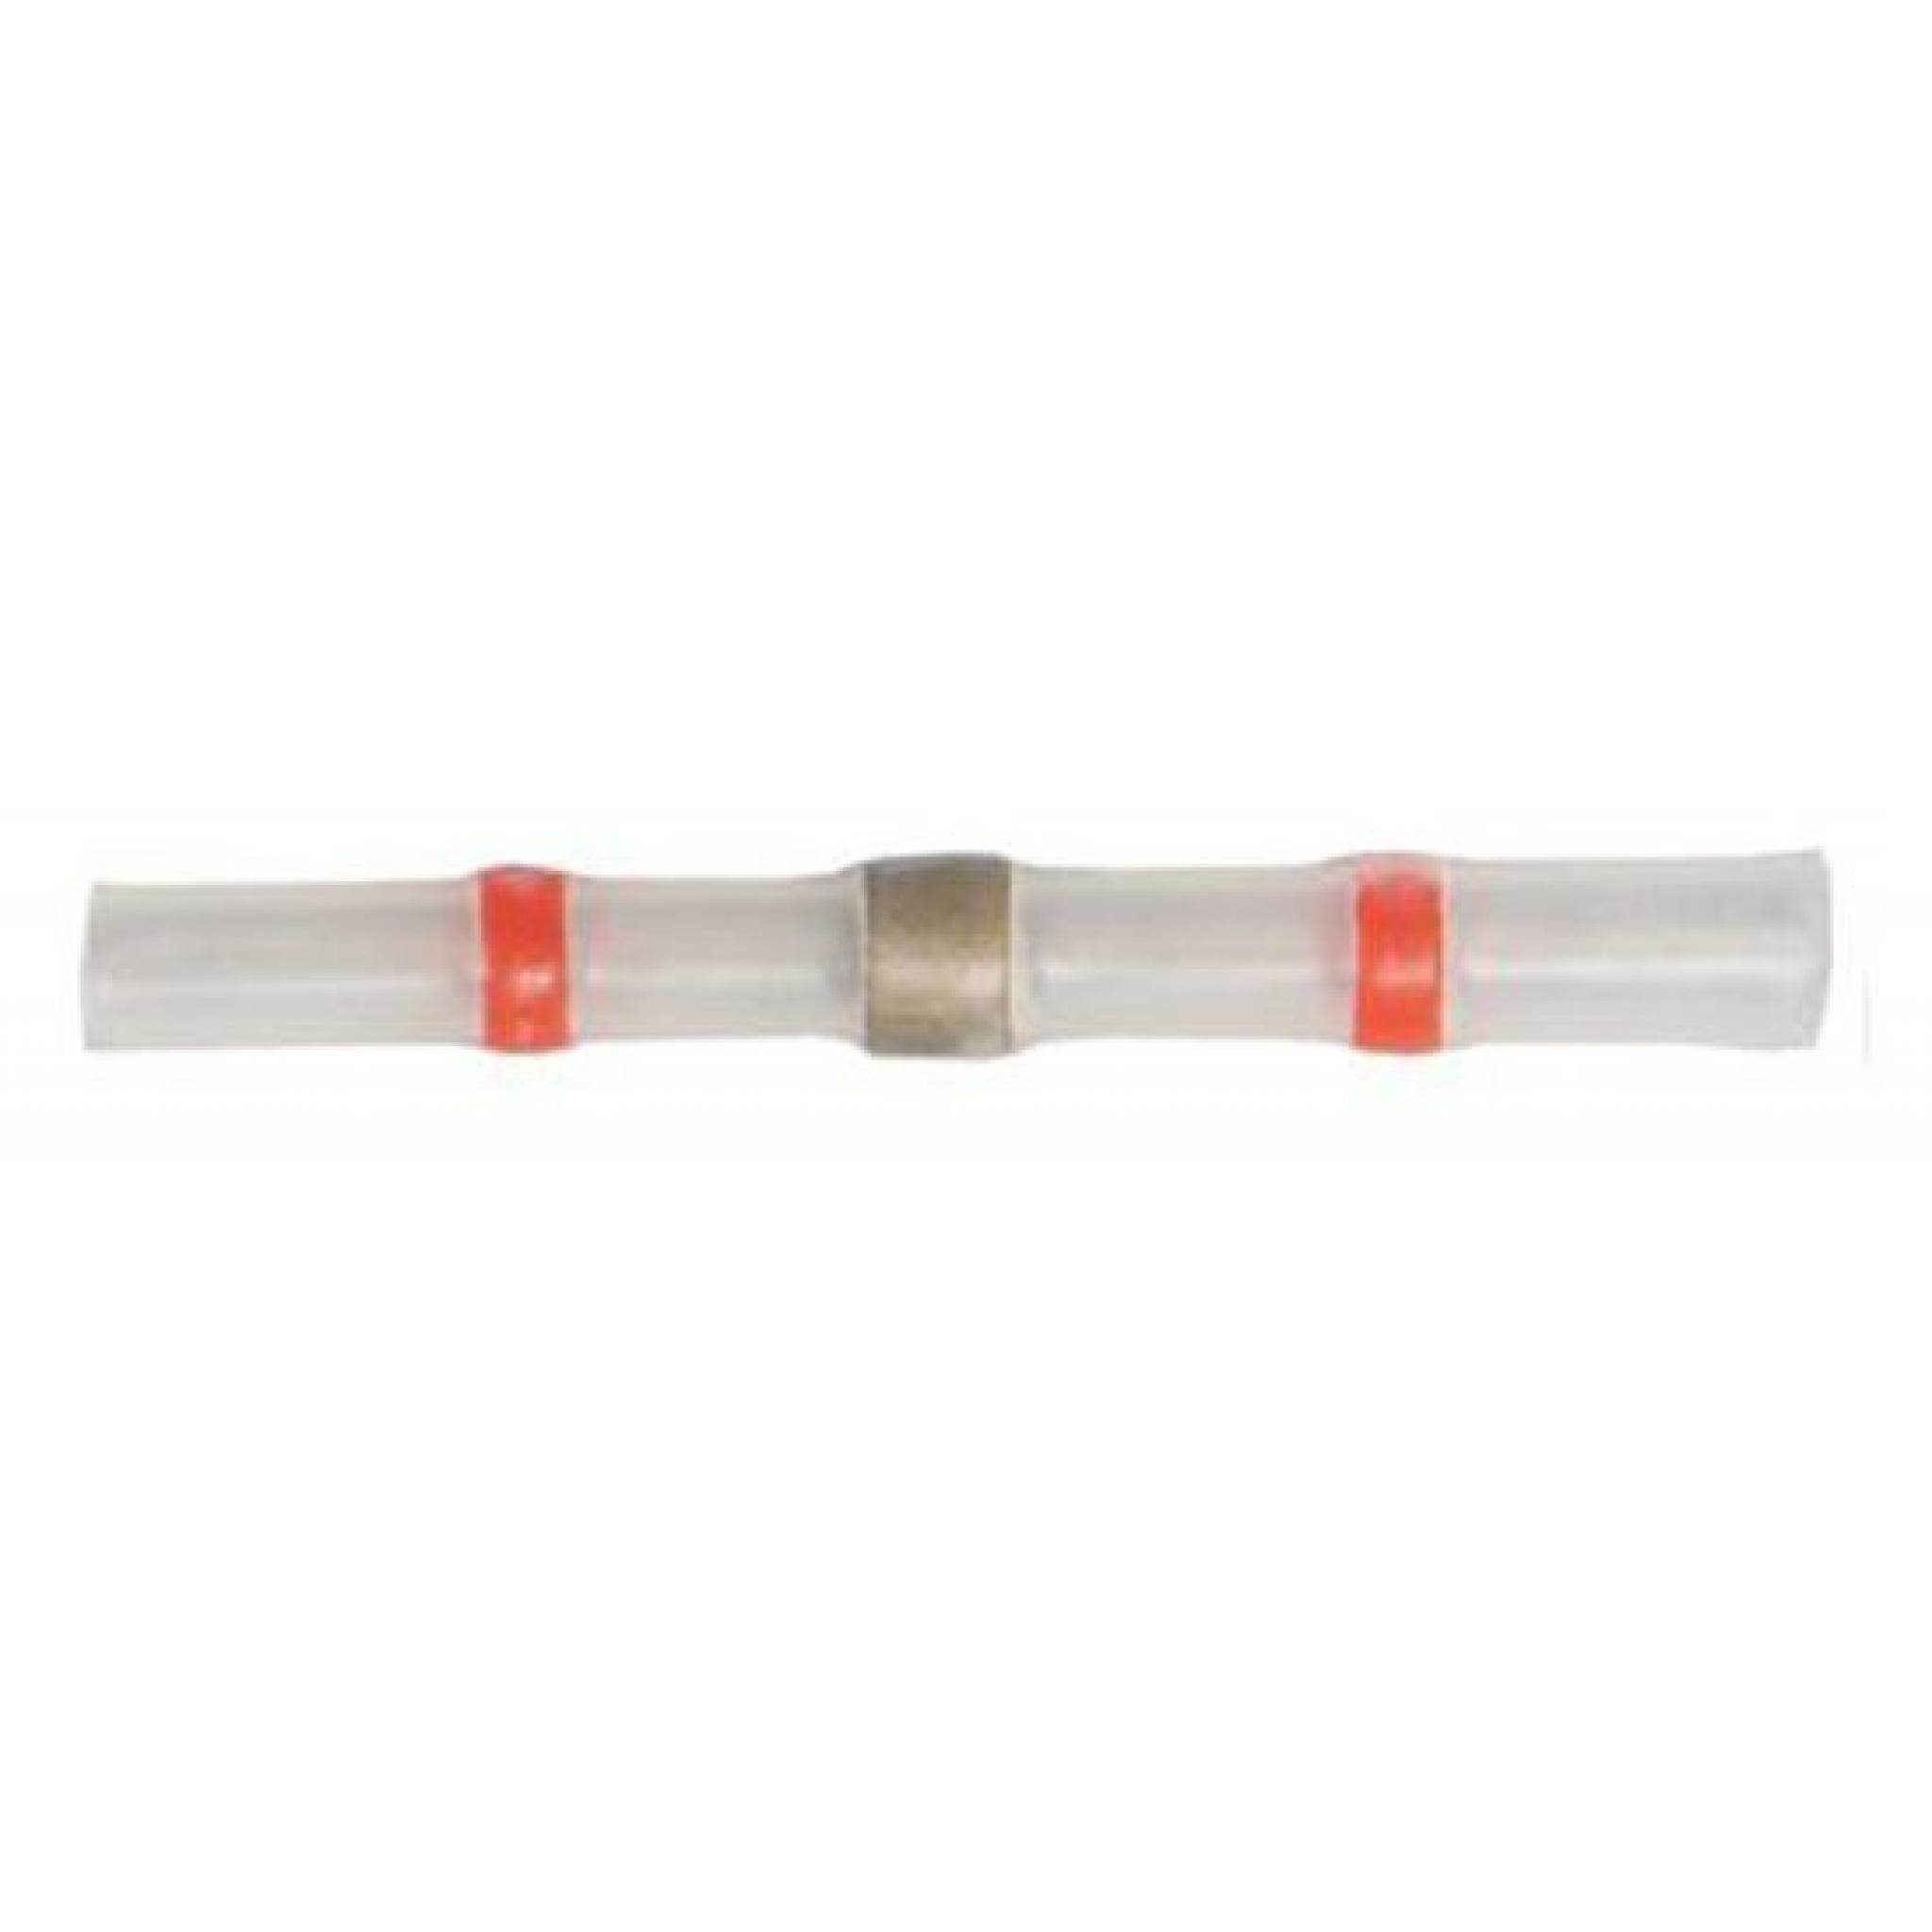 Red Heat Shrink Solder Sleeve Splice Adhesive Lined Wire Connector Heatshrink